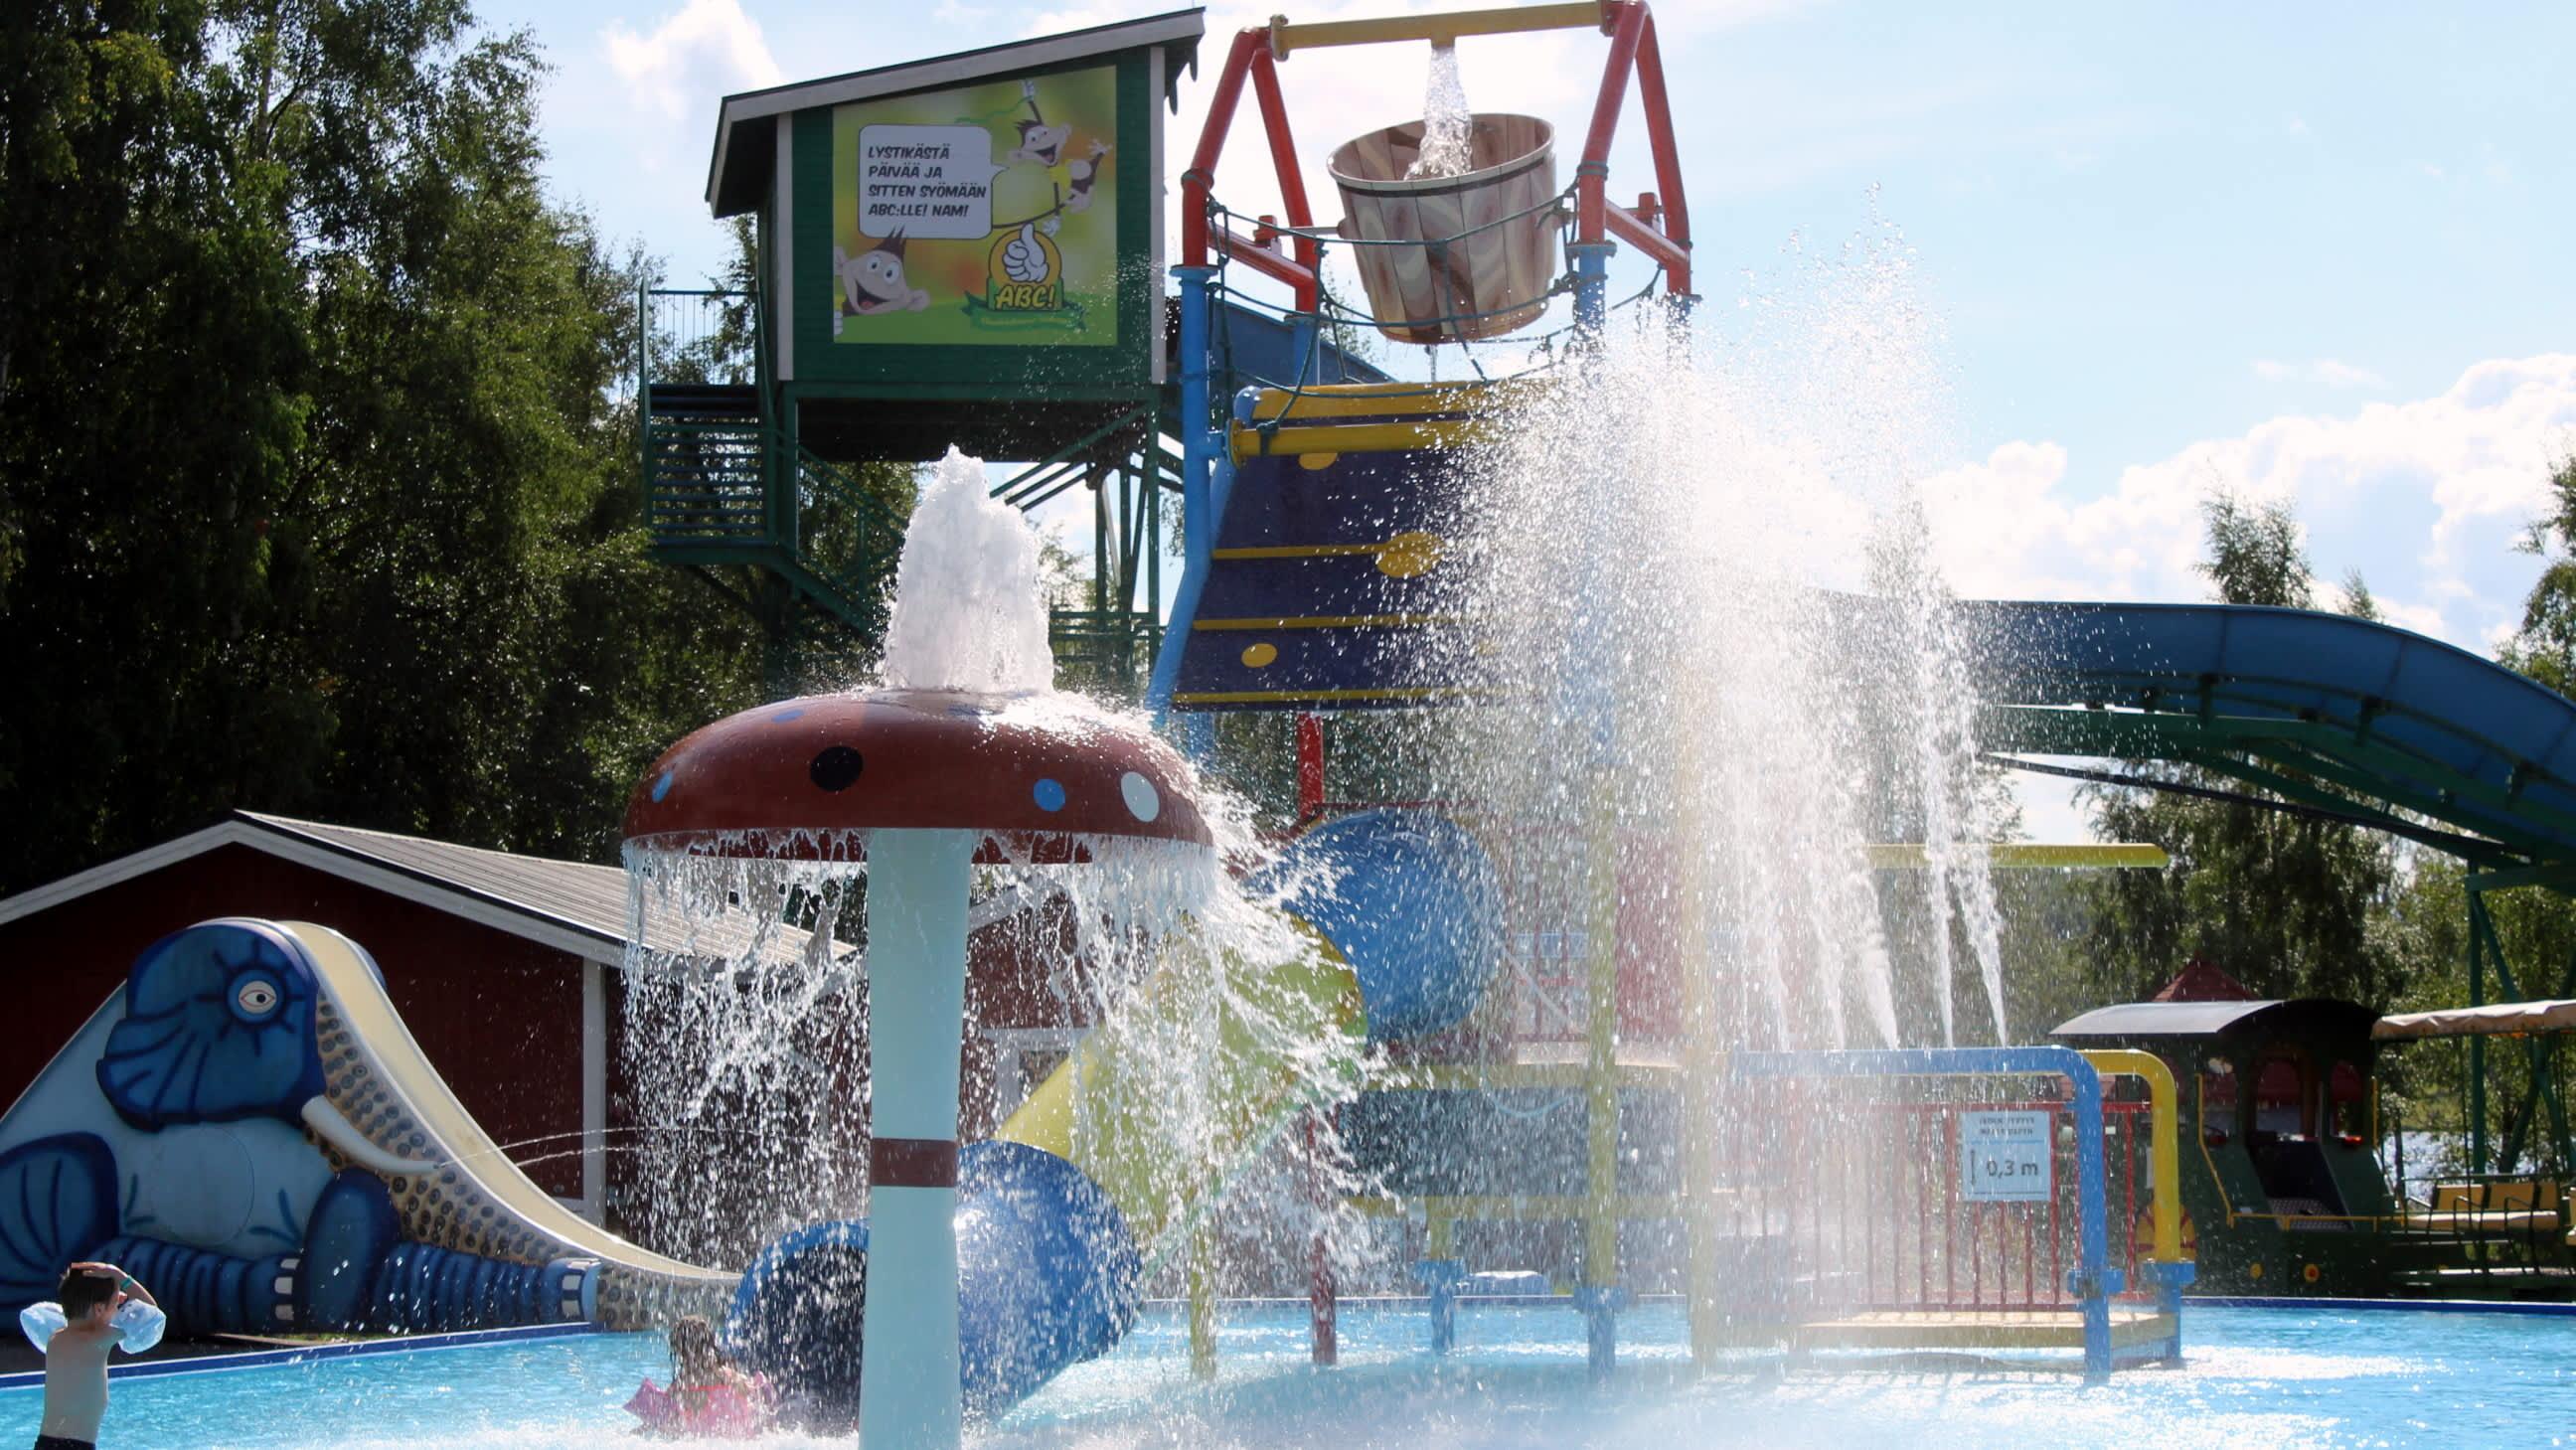 Lasten uima-allas Visulahdessa